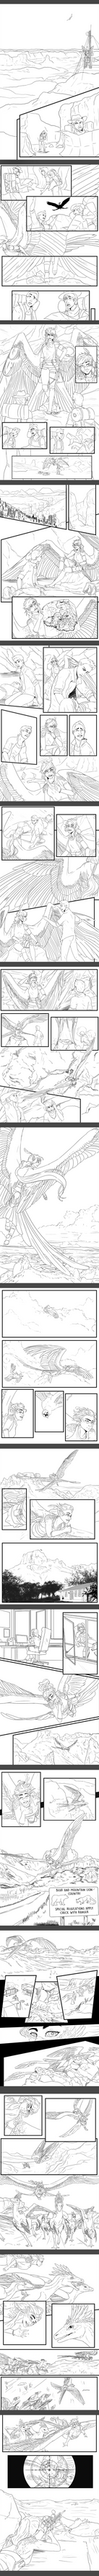 Sirocco: First Draft Comic [2017]